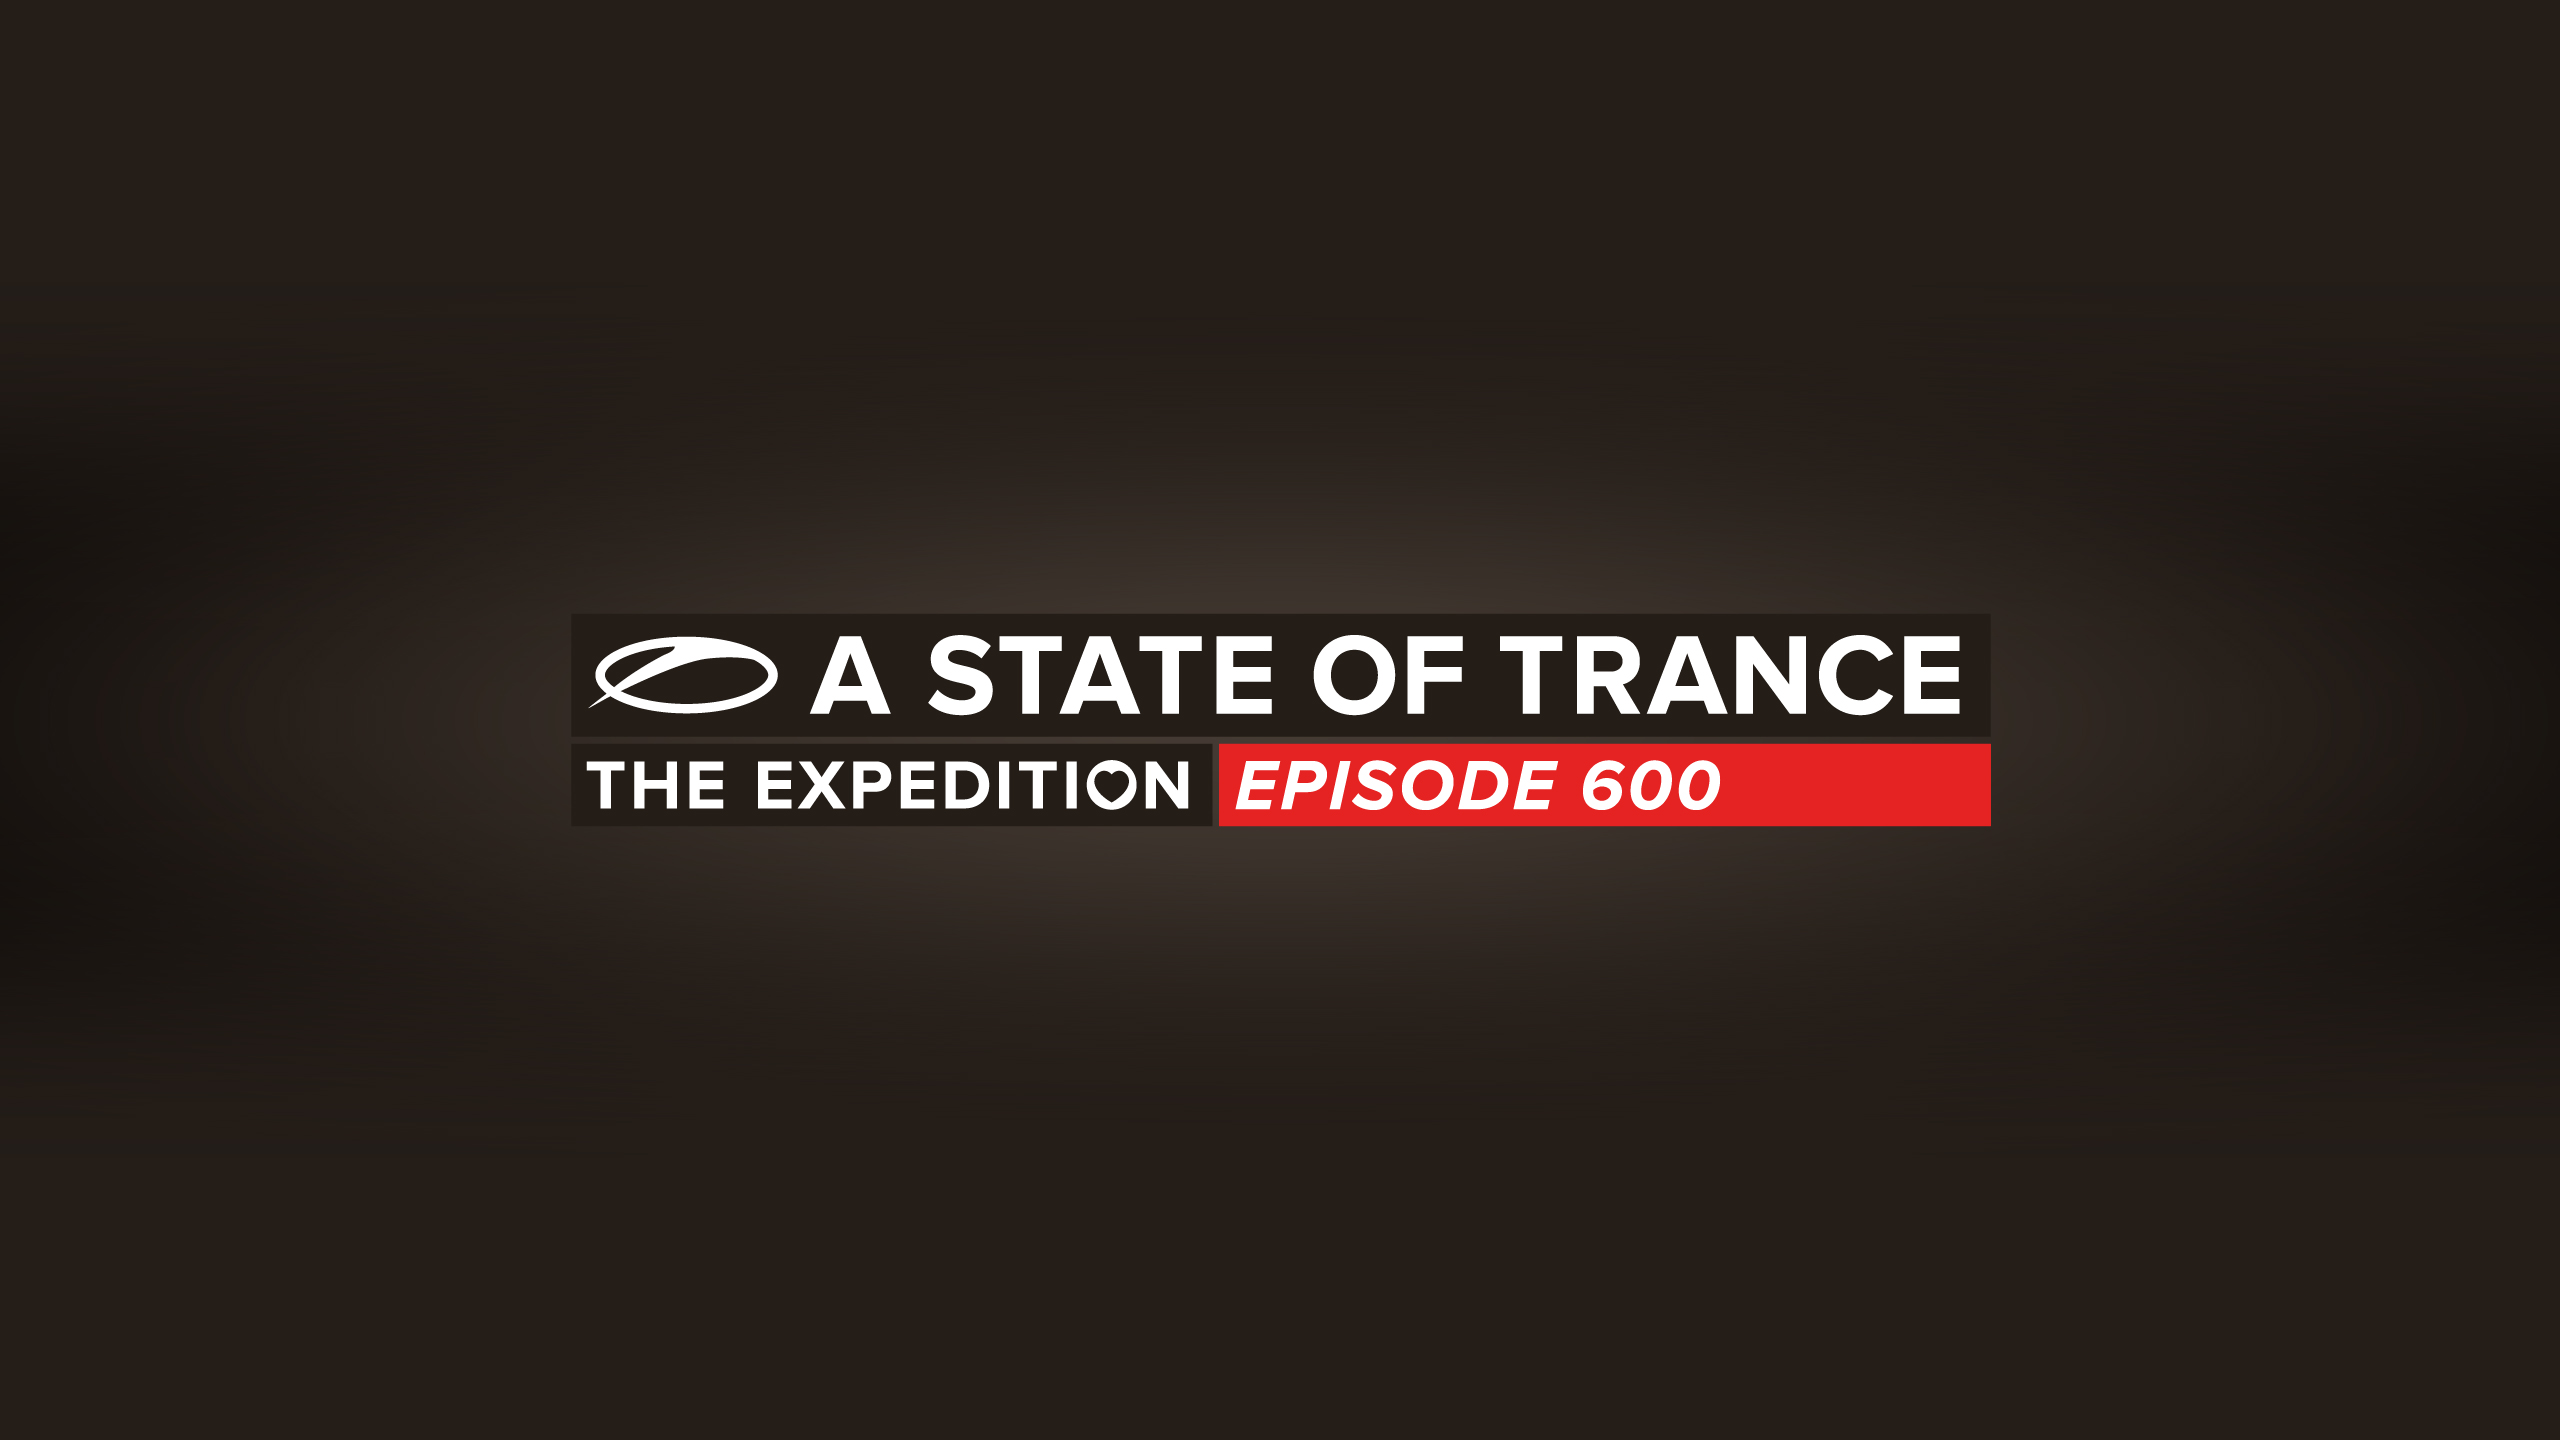 A State of Trance 600: заставка на рабочий стол (2560x1440)